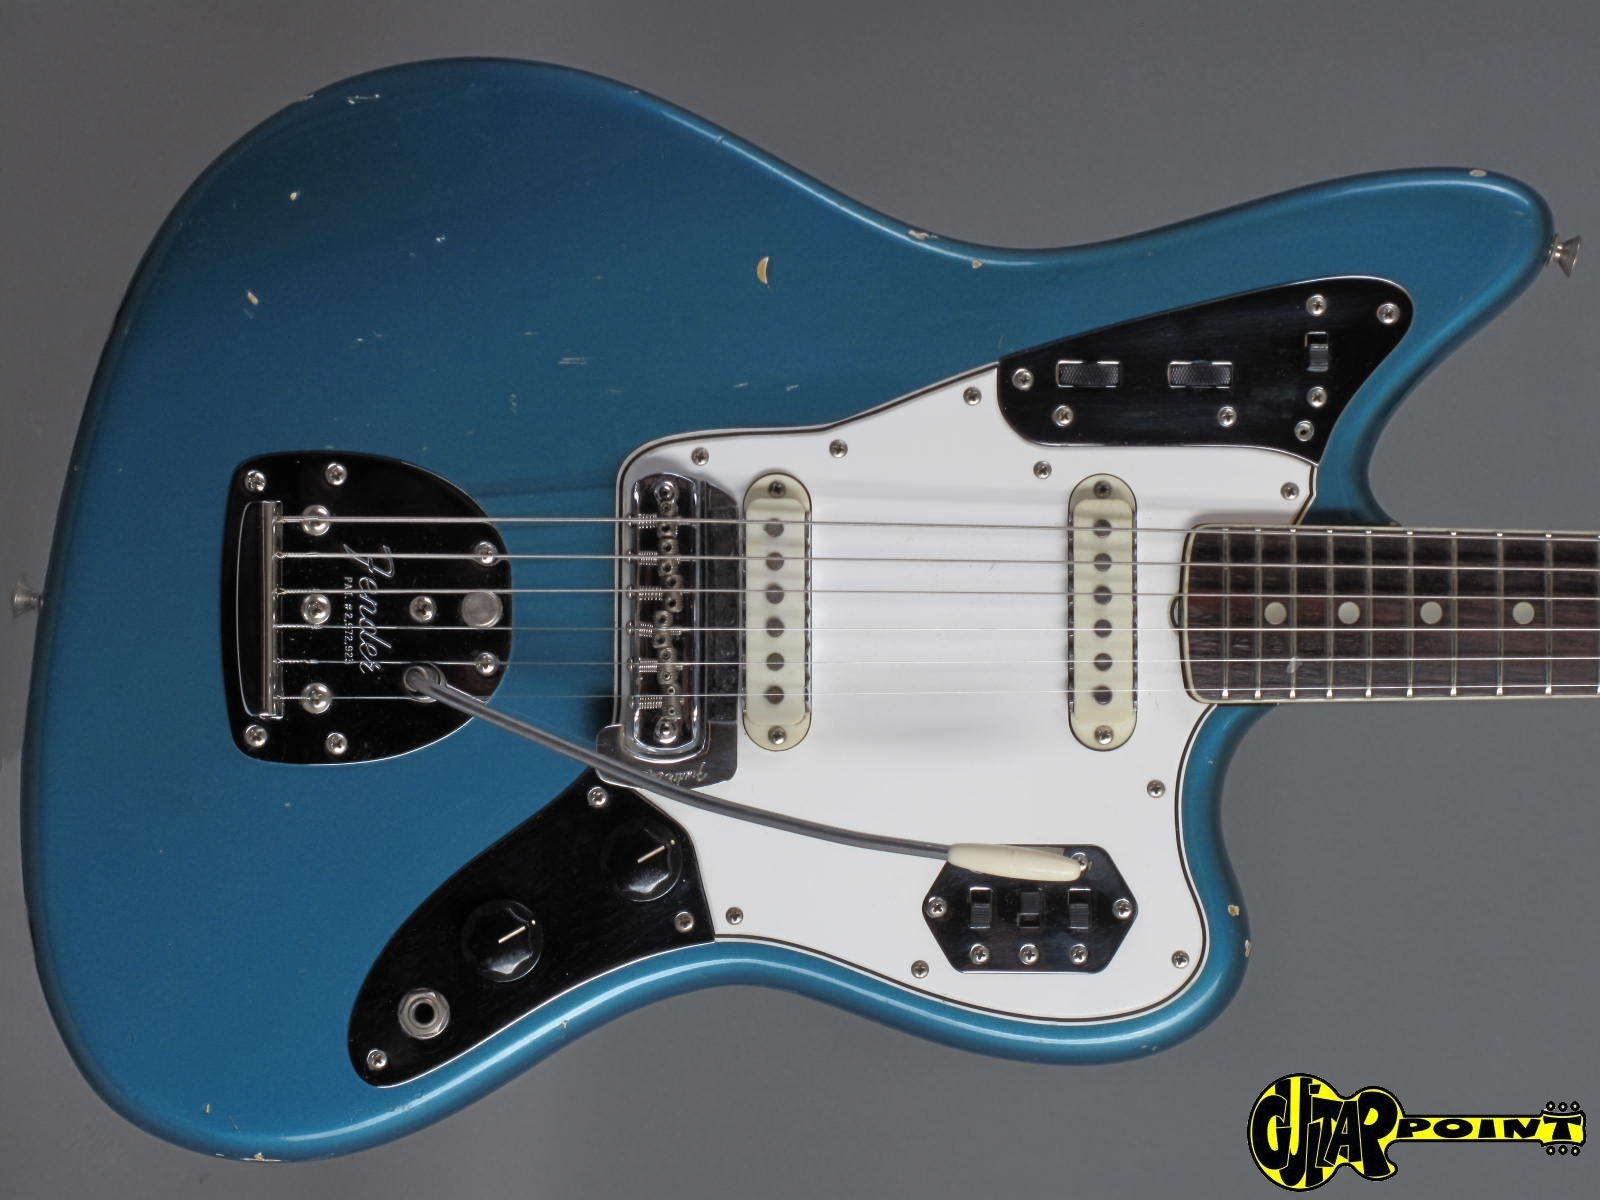 wohsc jaguar charcoal usa electric vintage guitars product fender frost imperial guitar